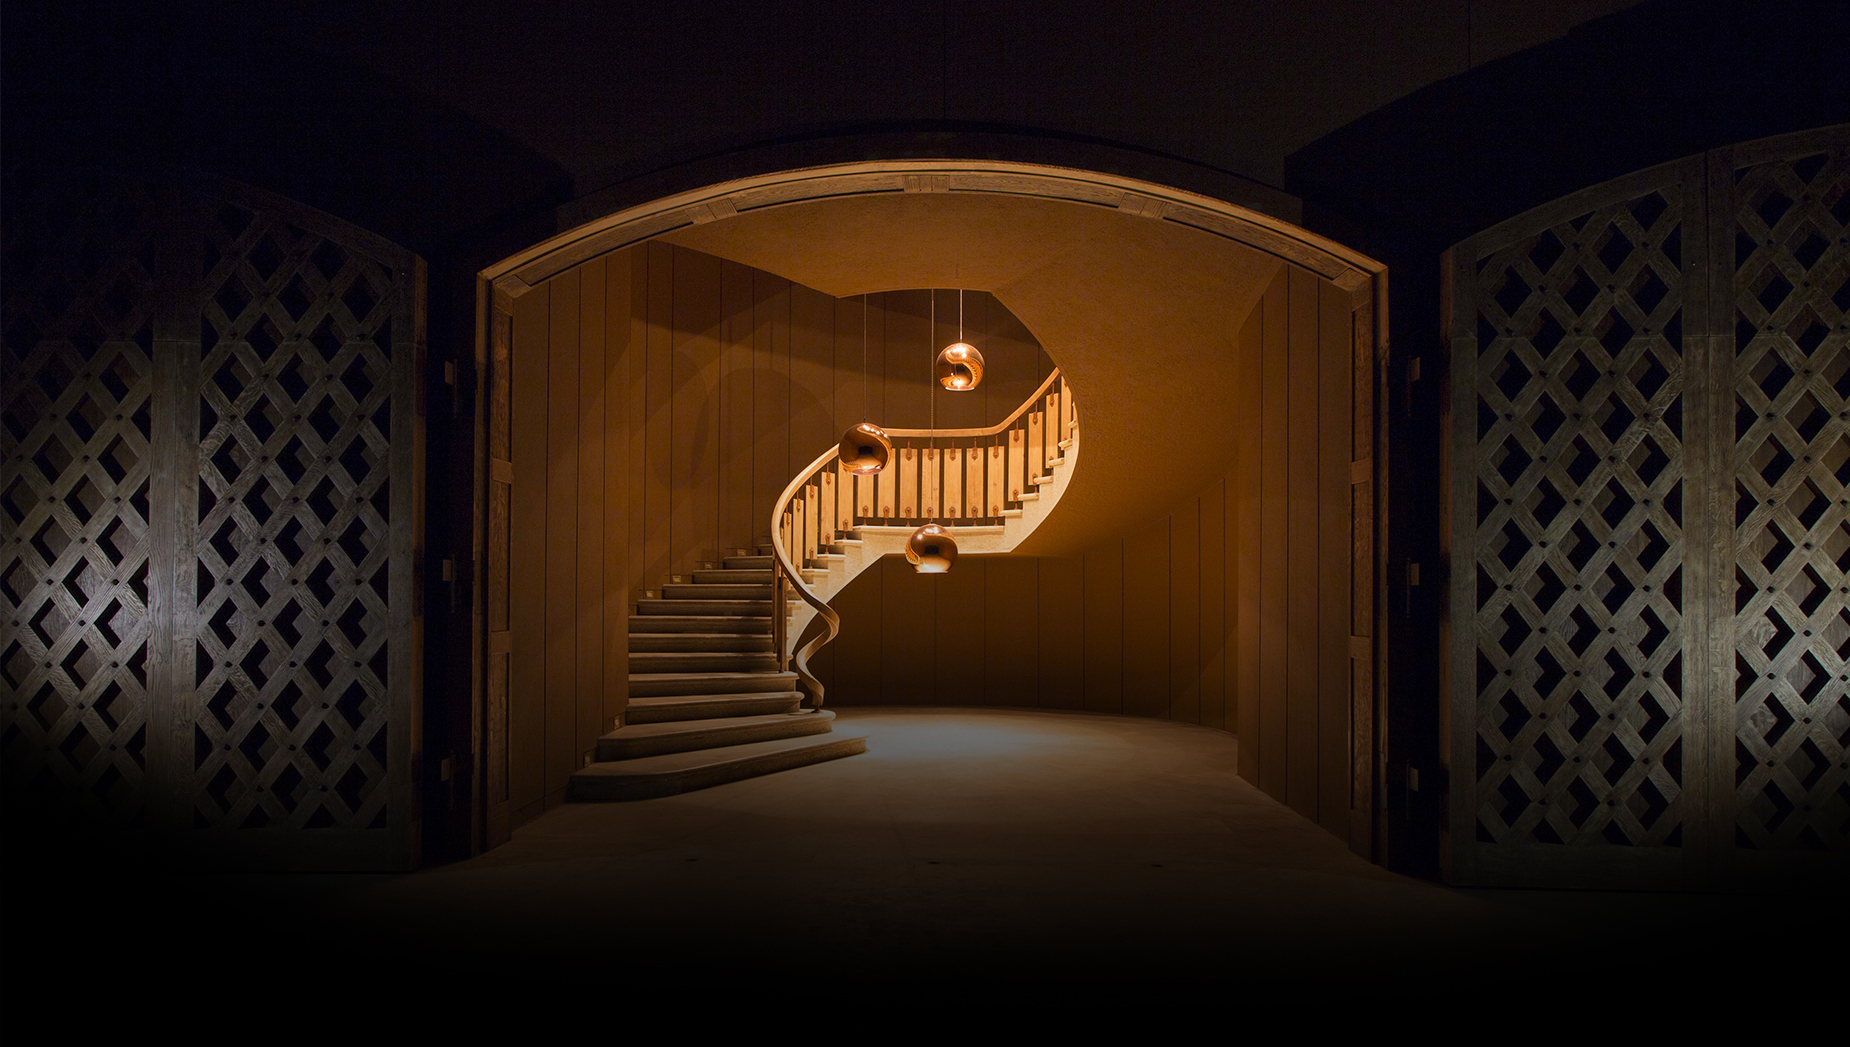 Copy of Inside Chateau d'Yquem cellars | Sauternes, Grionde Region of Bordeaux, France